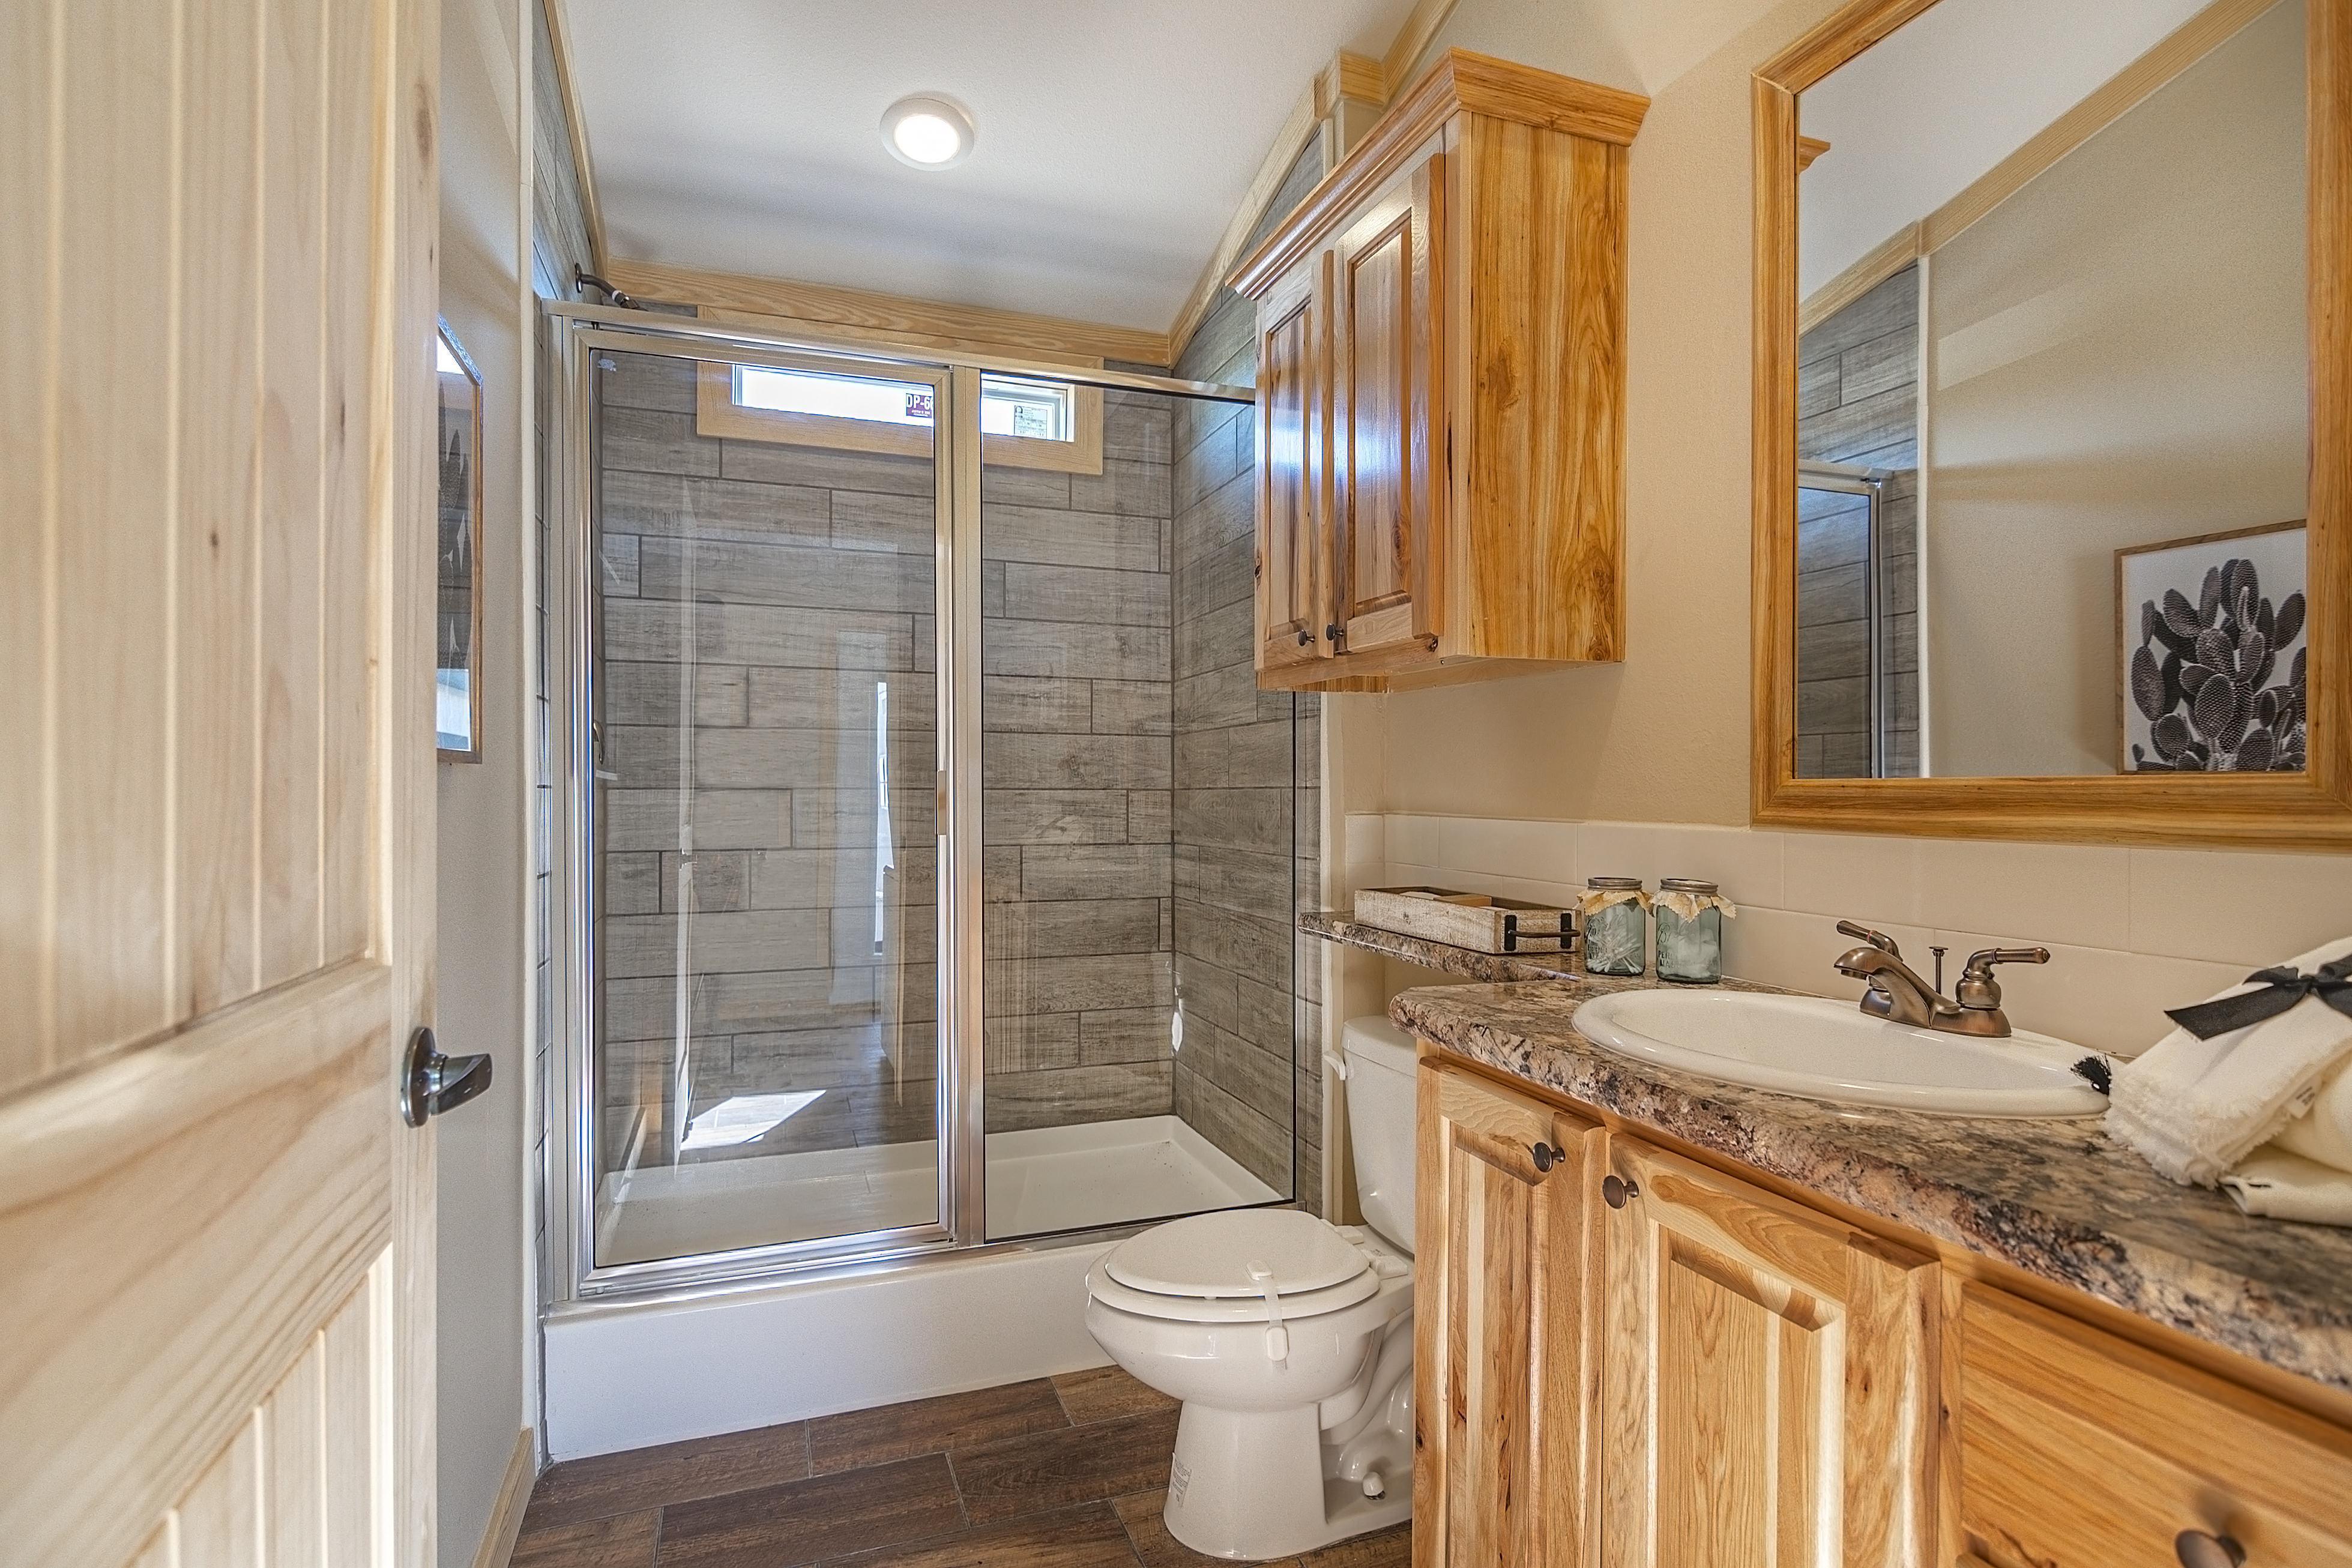 Oak Creek Homes Bryan Tx >> Smart Cottage Heron J50EP8 Home Plan by Oak Creek Homes in Oak Creek Homes Bryan